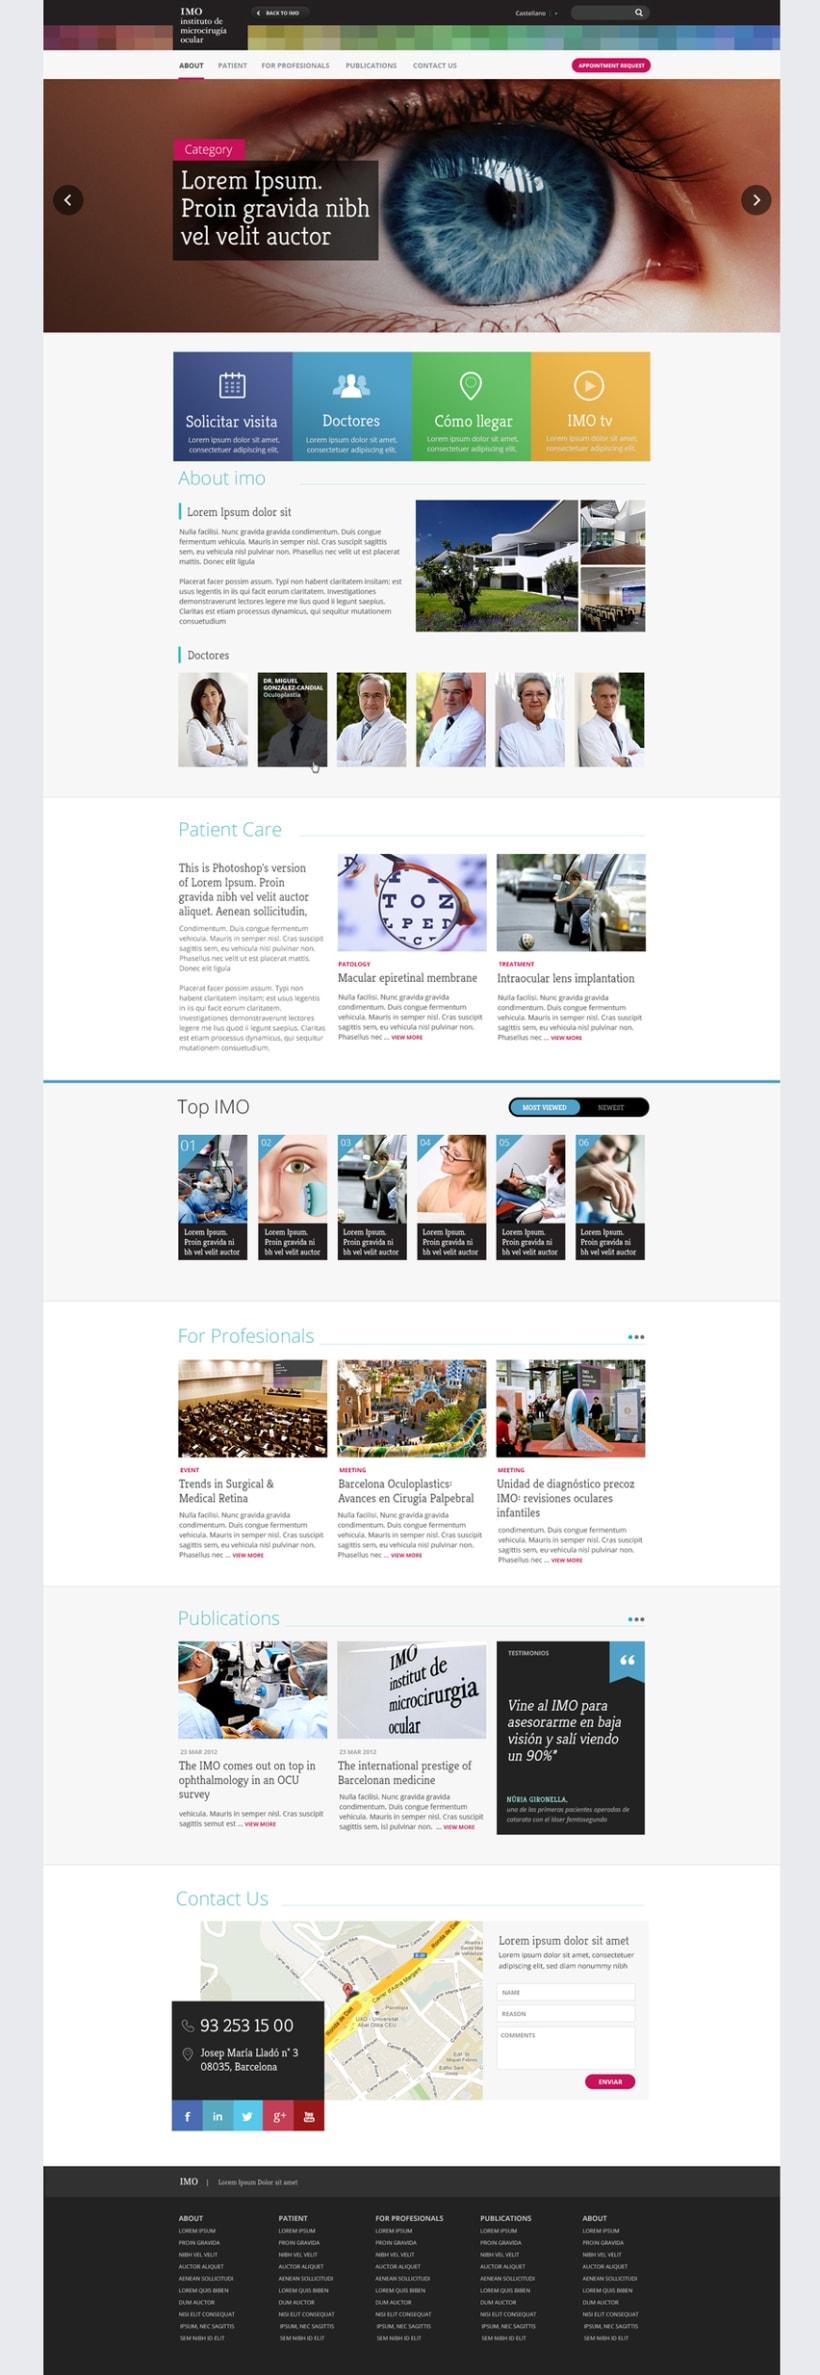 IMO Corporate Site 3